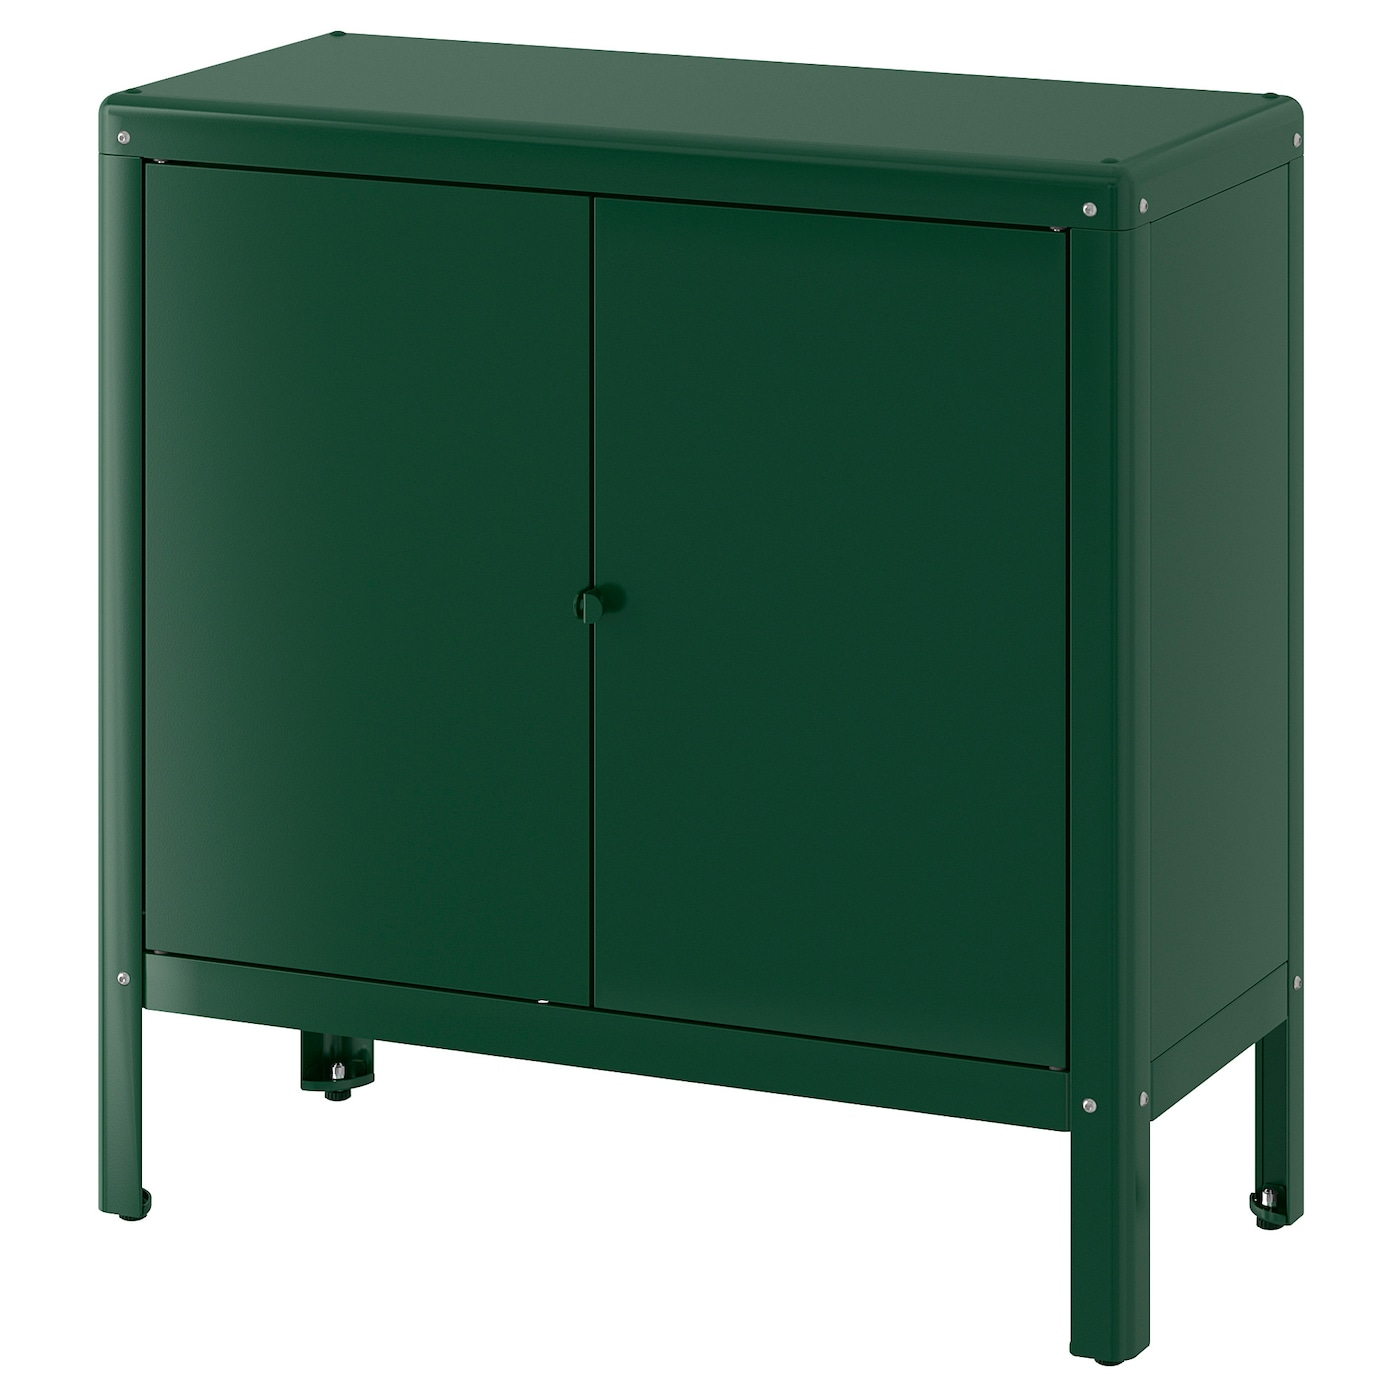 KOLBJÖRN Élément rangement int/extérieur - vert 10x10 cm